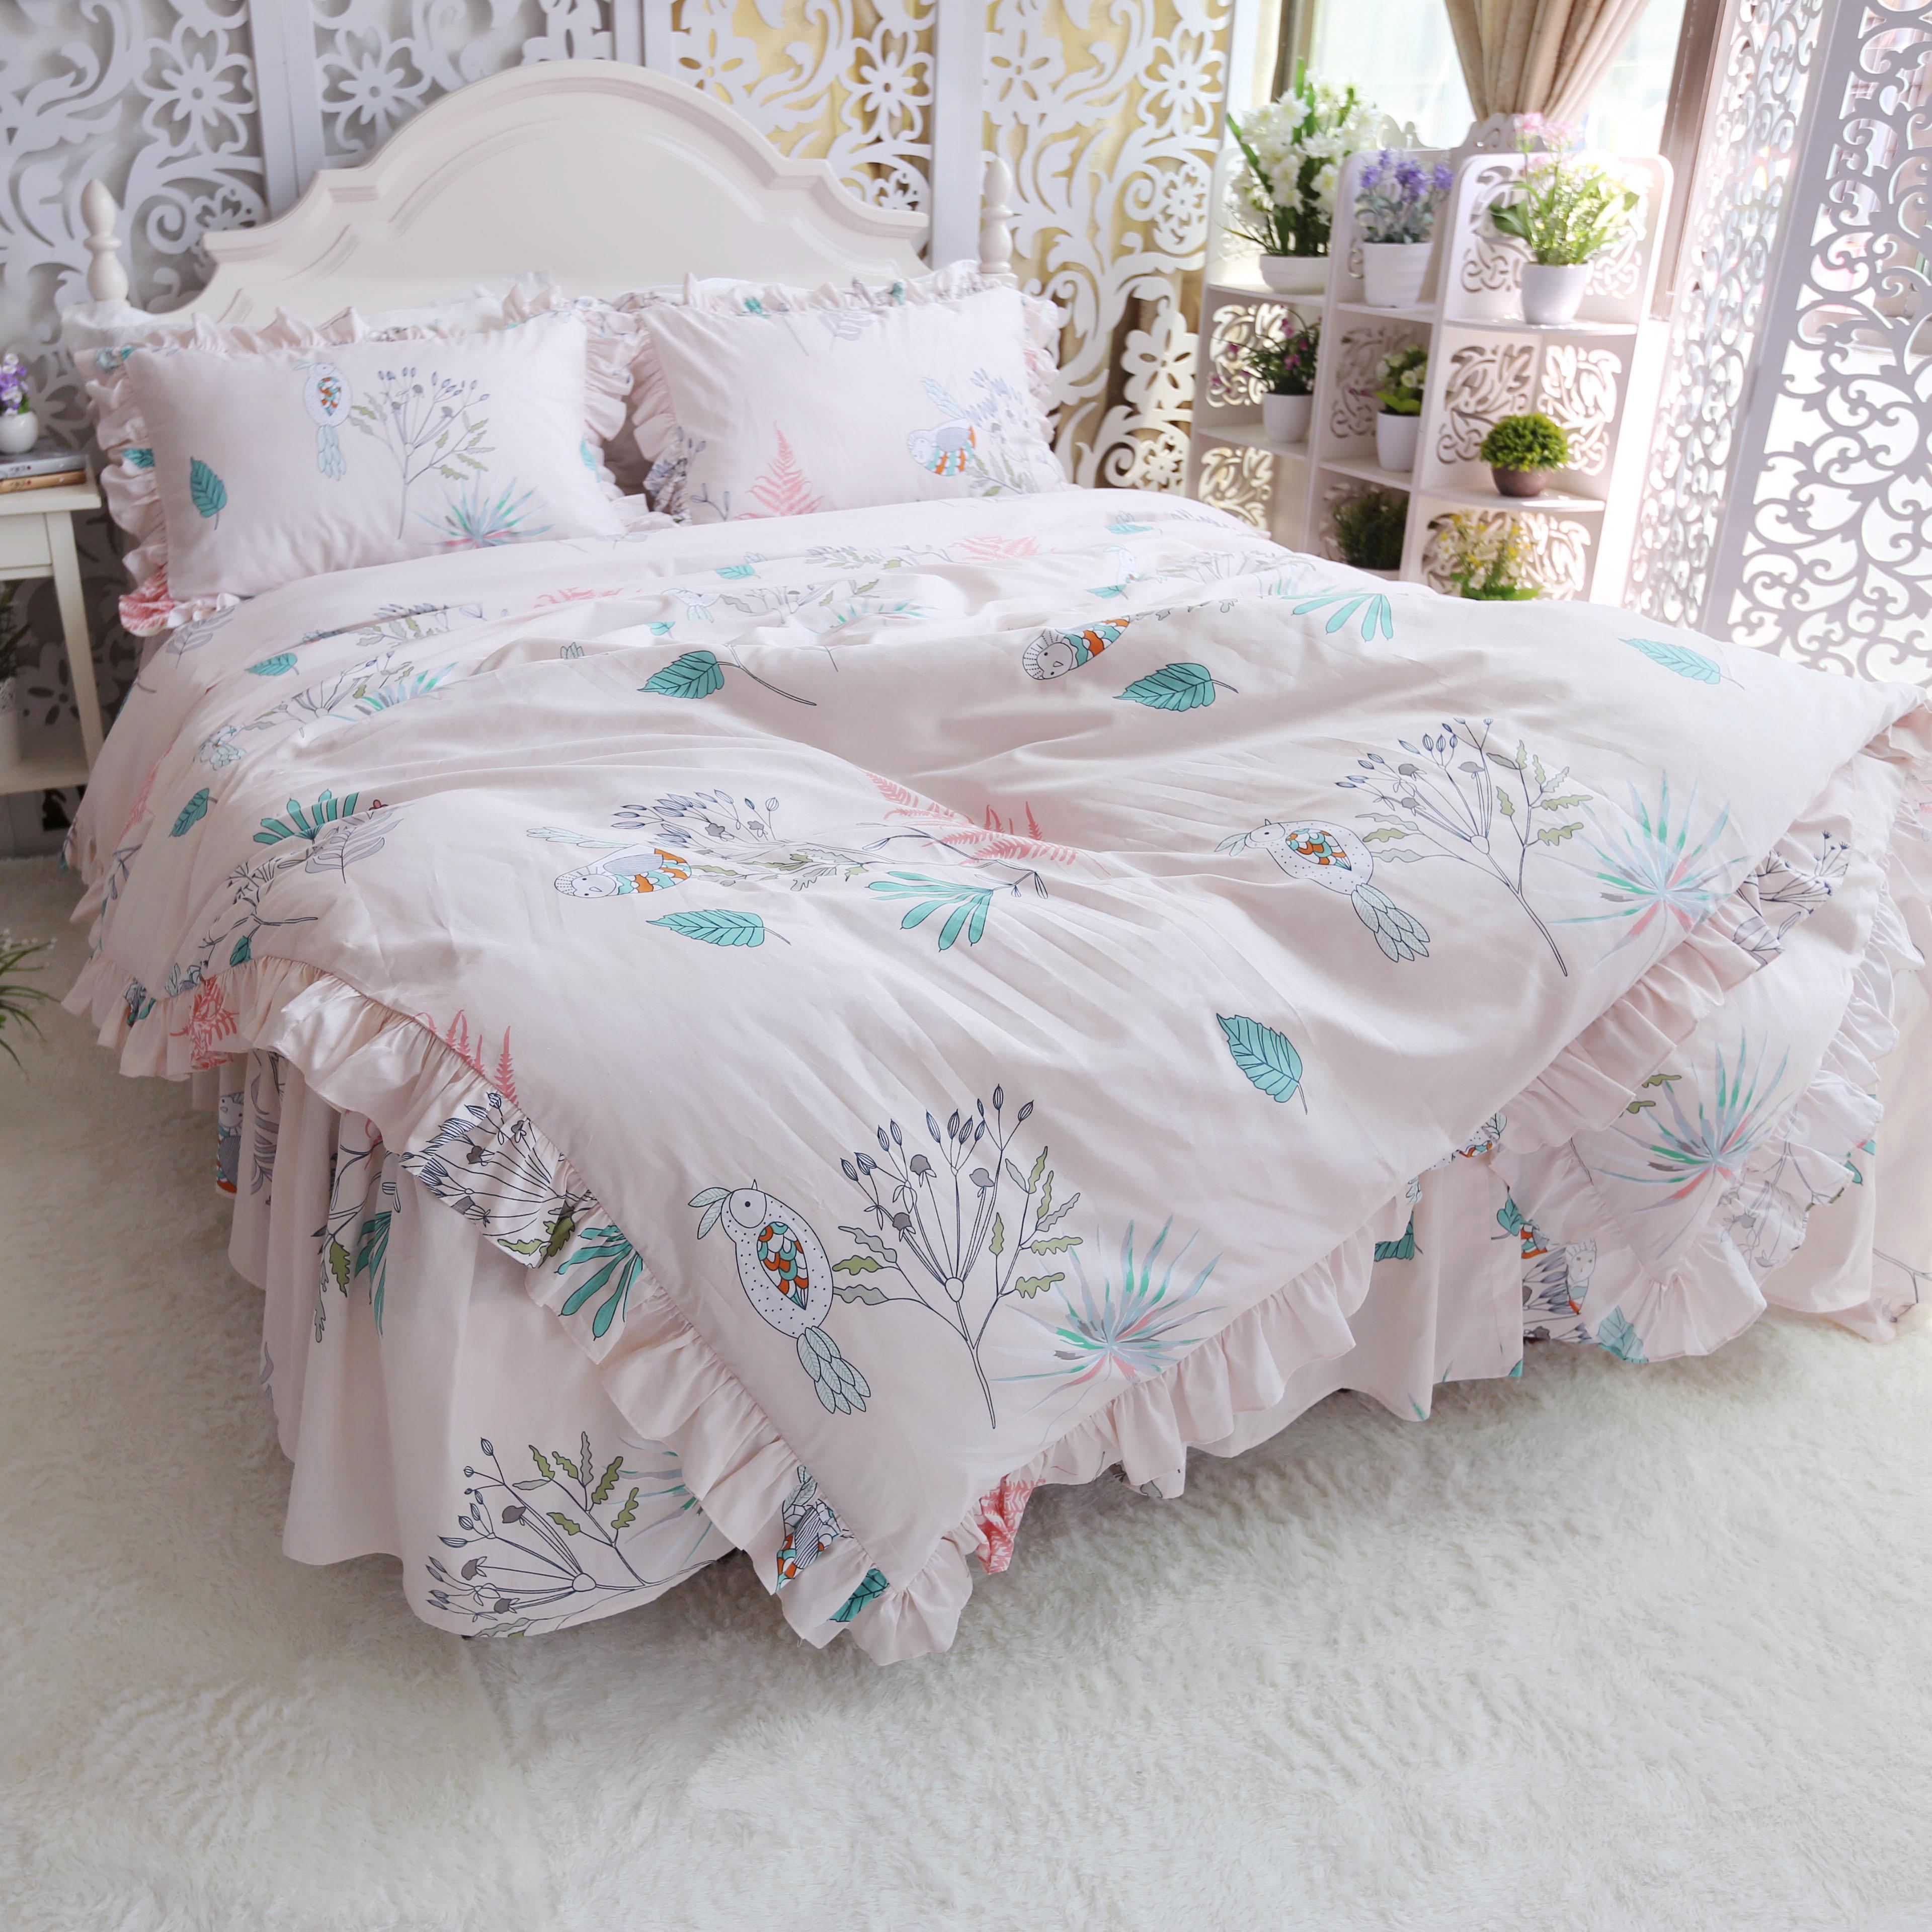 Cotton bedding set twill princess wind ruffled quilt cover pillowcase plant flower bird print bed spreadCotton bedding set twill princess wind ruffled quilt cover pillowcase plant flower bird print bed spread